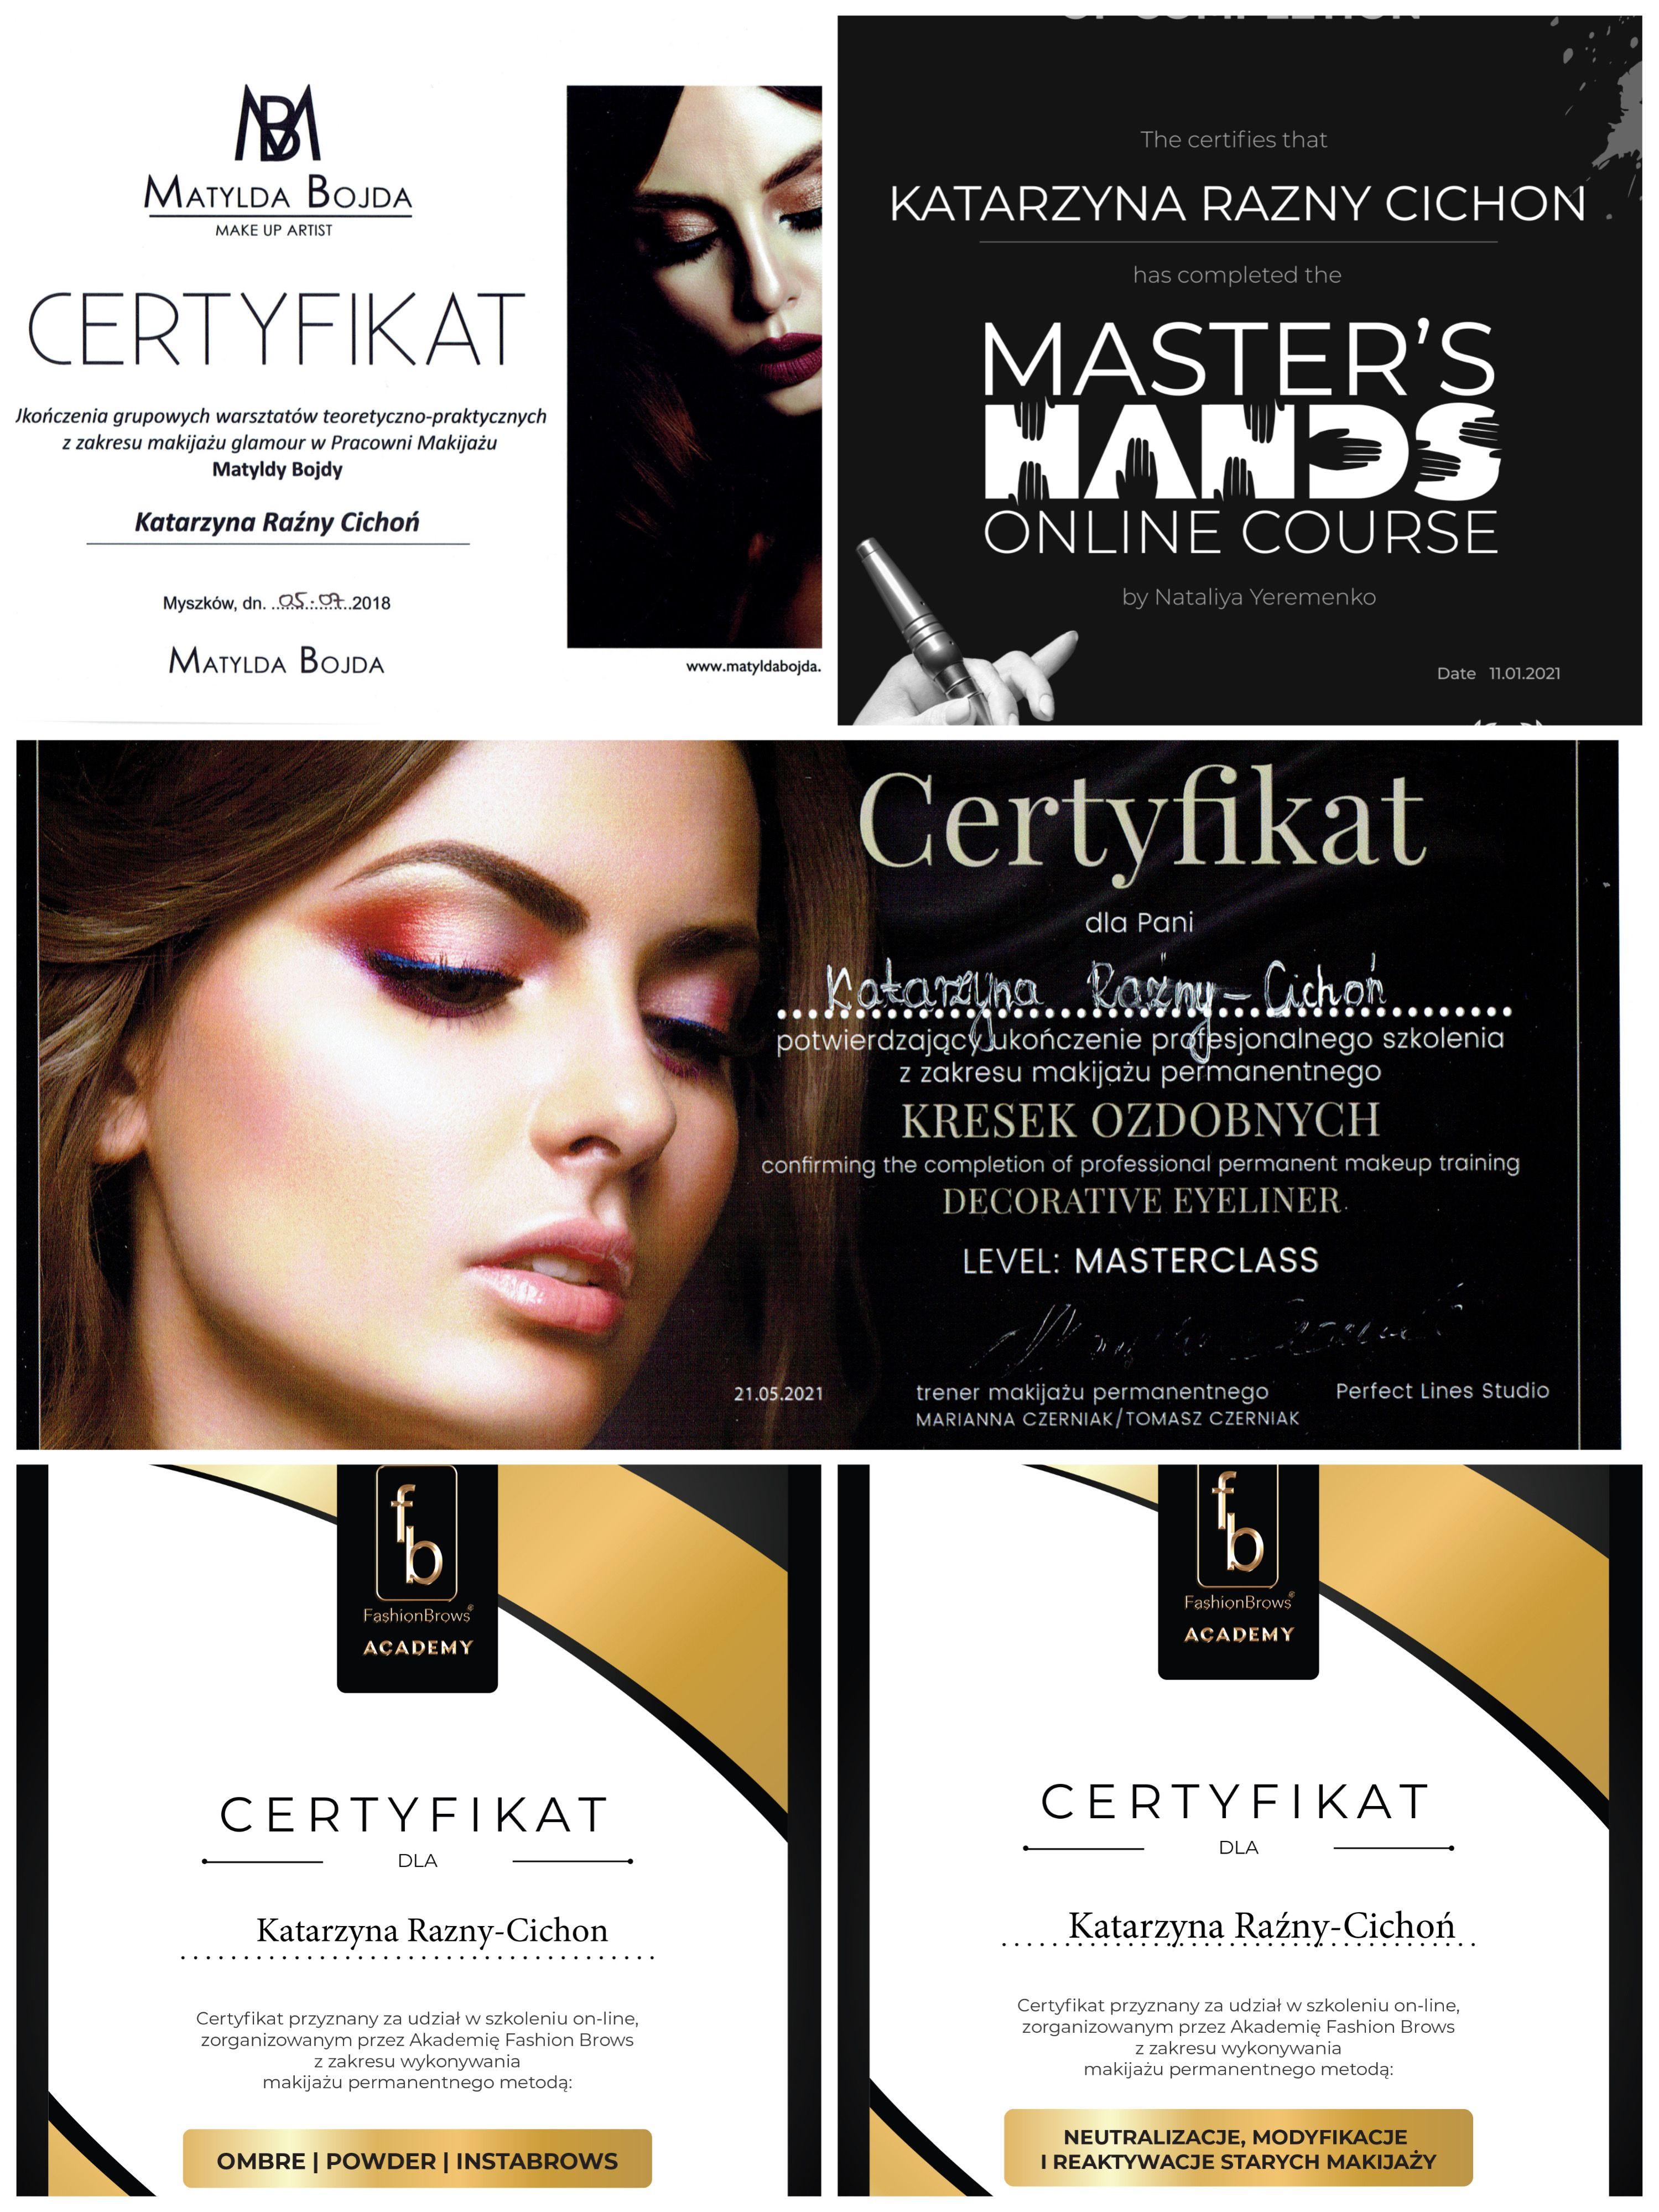 Permanent makeup artist certificates